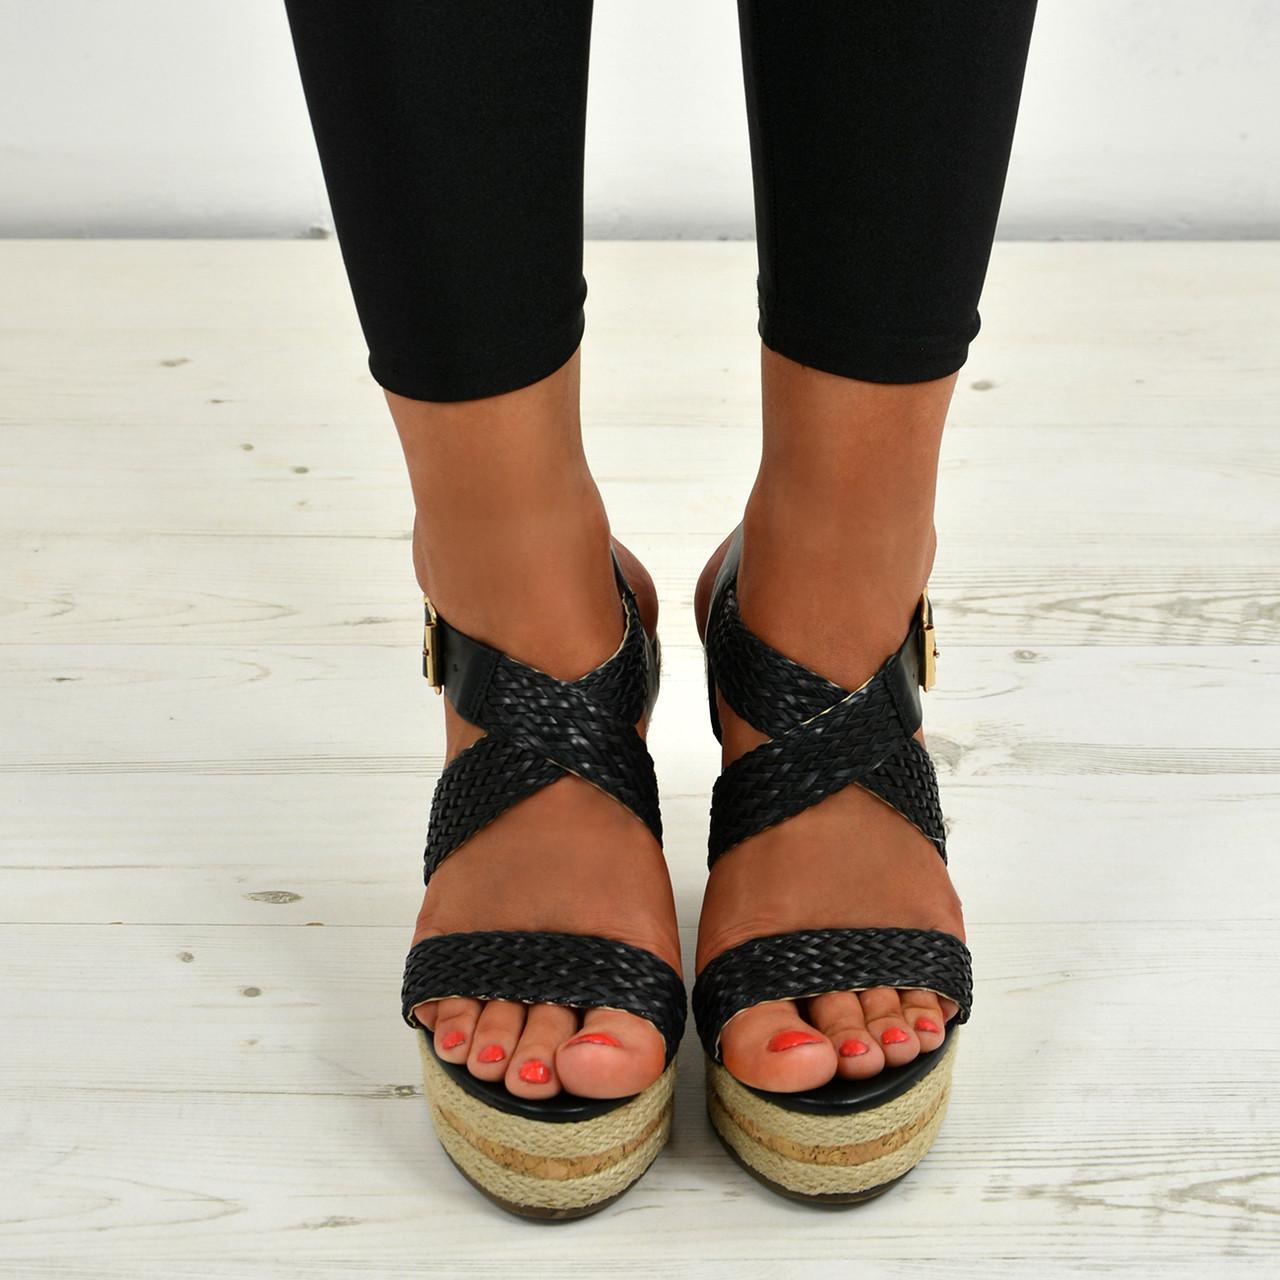 88c0569896e7 Ladies Womens Cork Wedge Sandals Platform Ankle Strap Braids Summer Shoes  Sizes